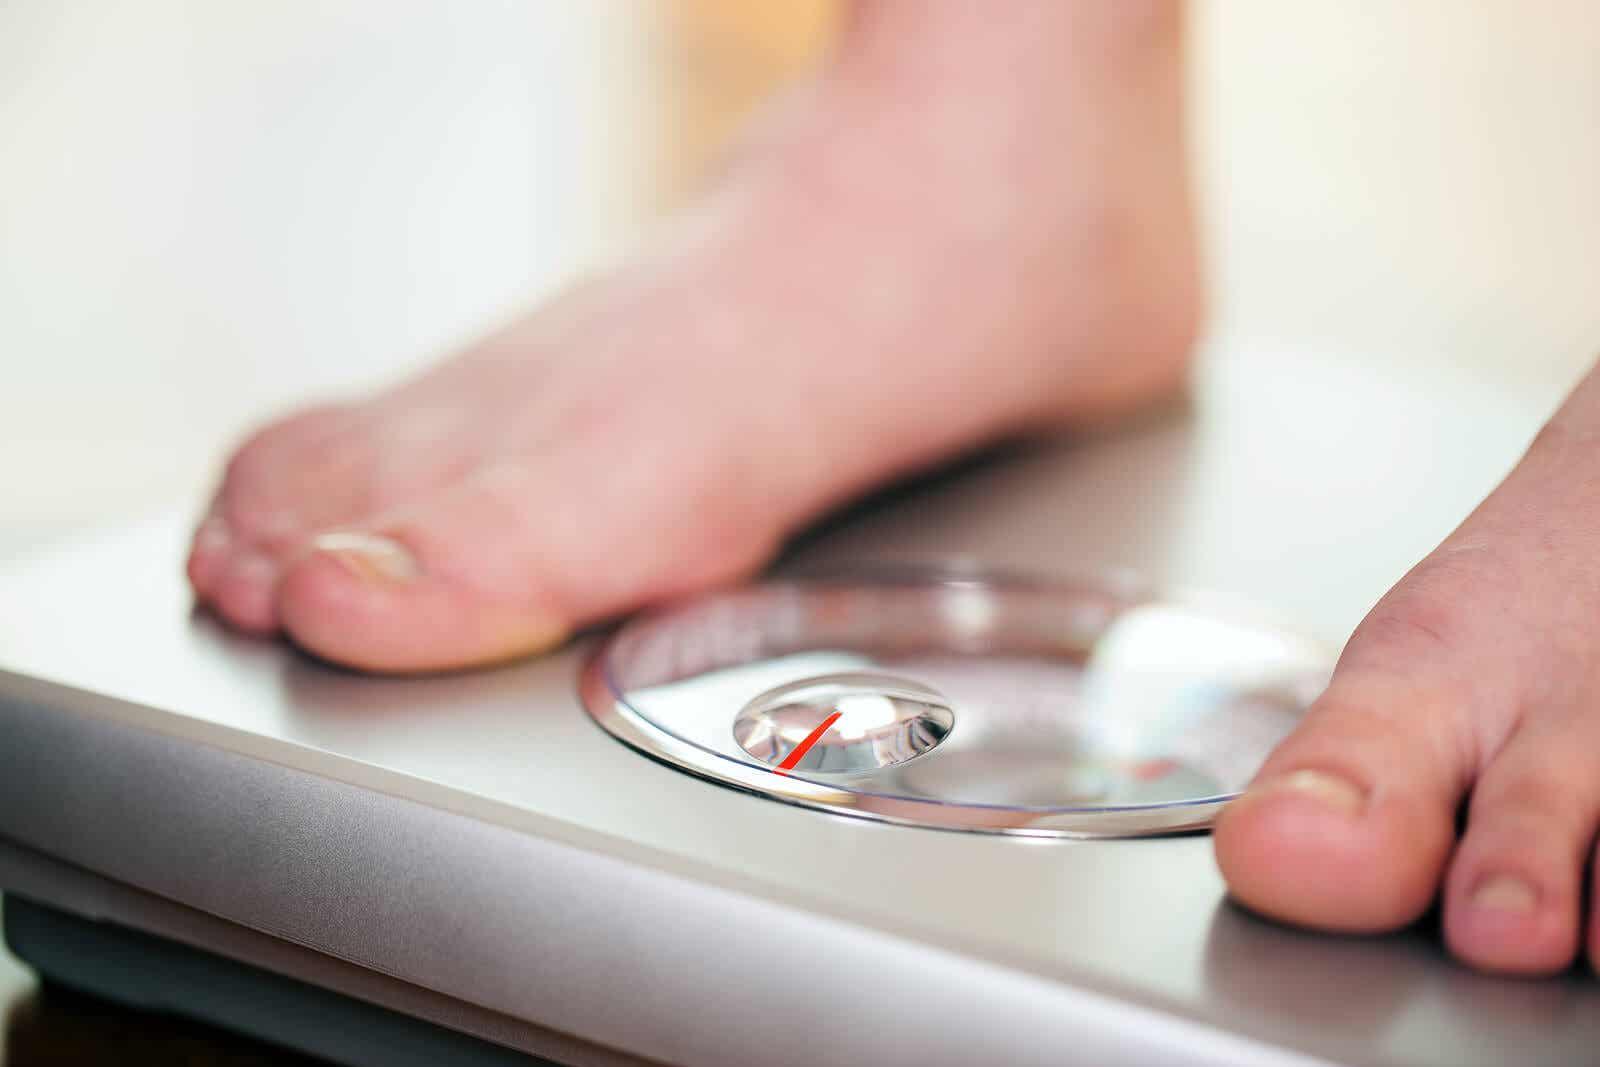 Pesarse para medir dieta saludable.